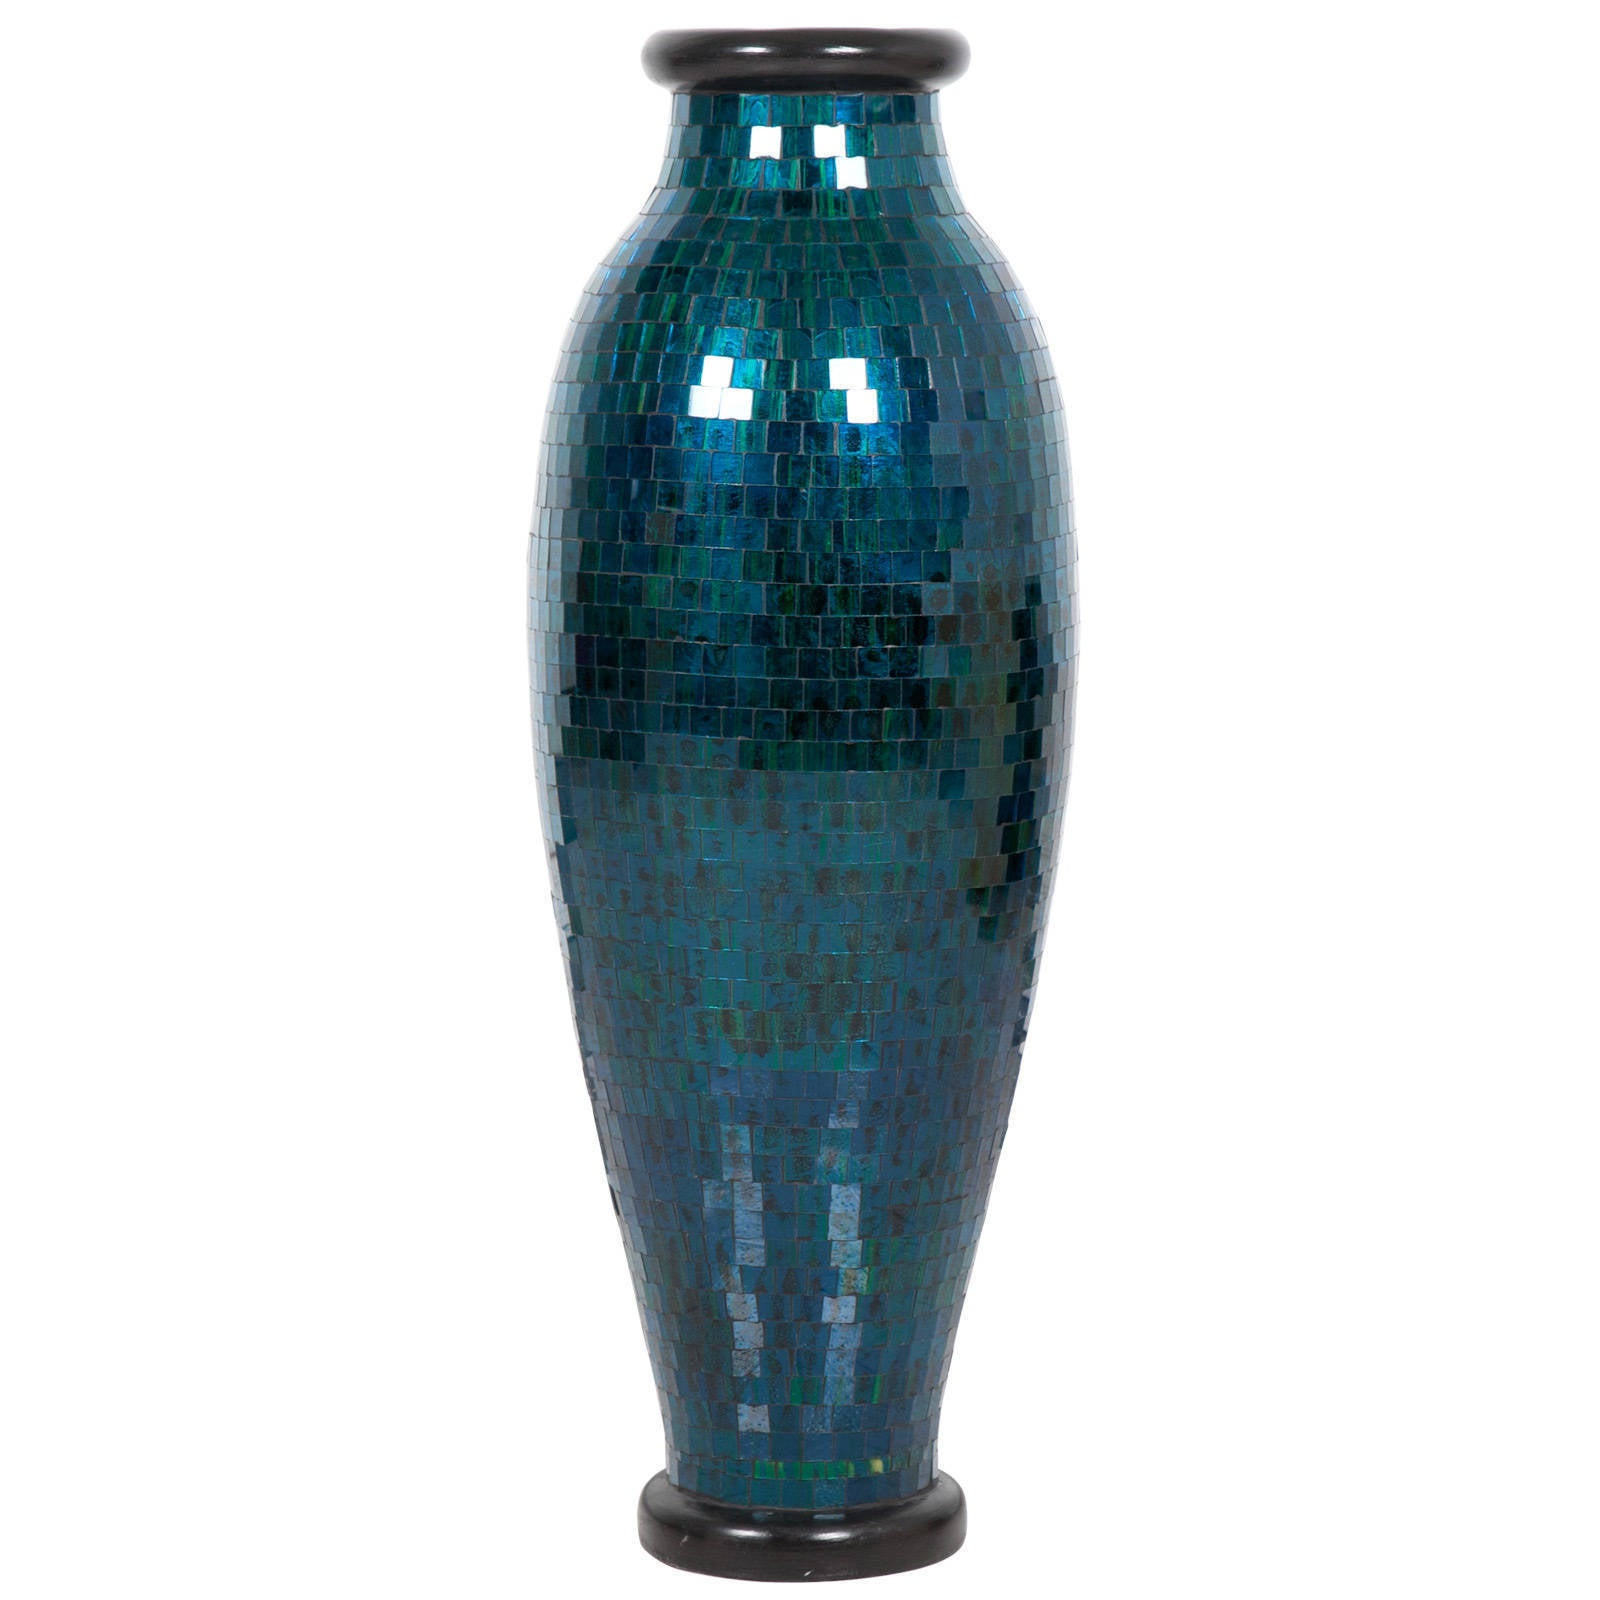 Turquoise mosaic floor vase indonesia free shipping today turquoise mosaic floor vase indonesia free shipping today overstock 15428679 reviewsmspy